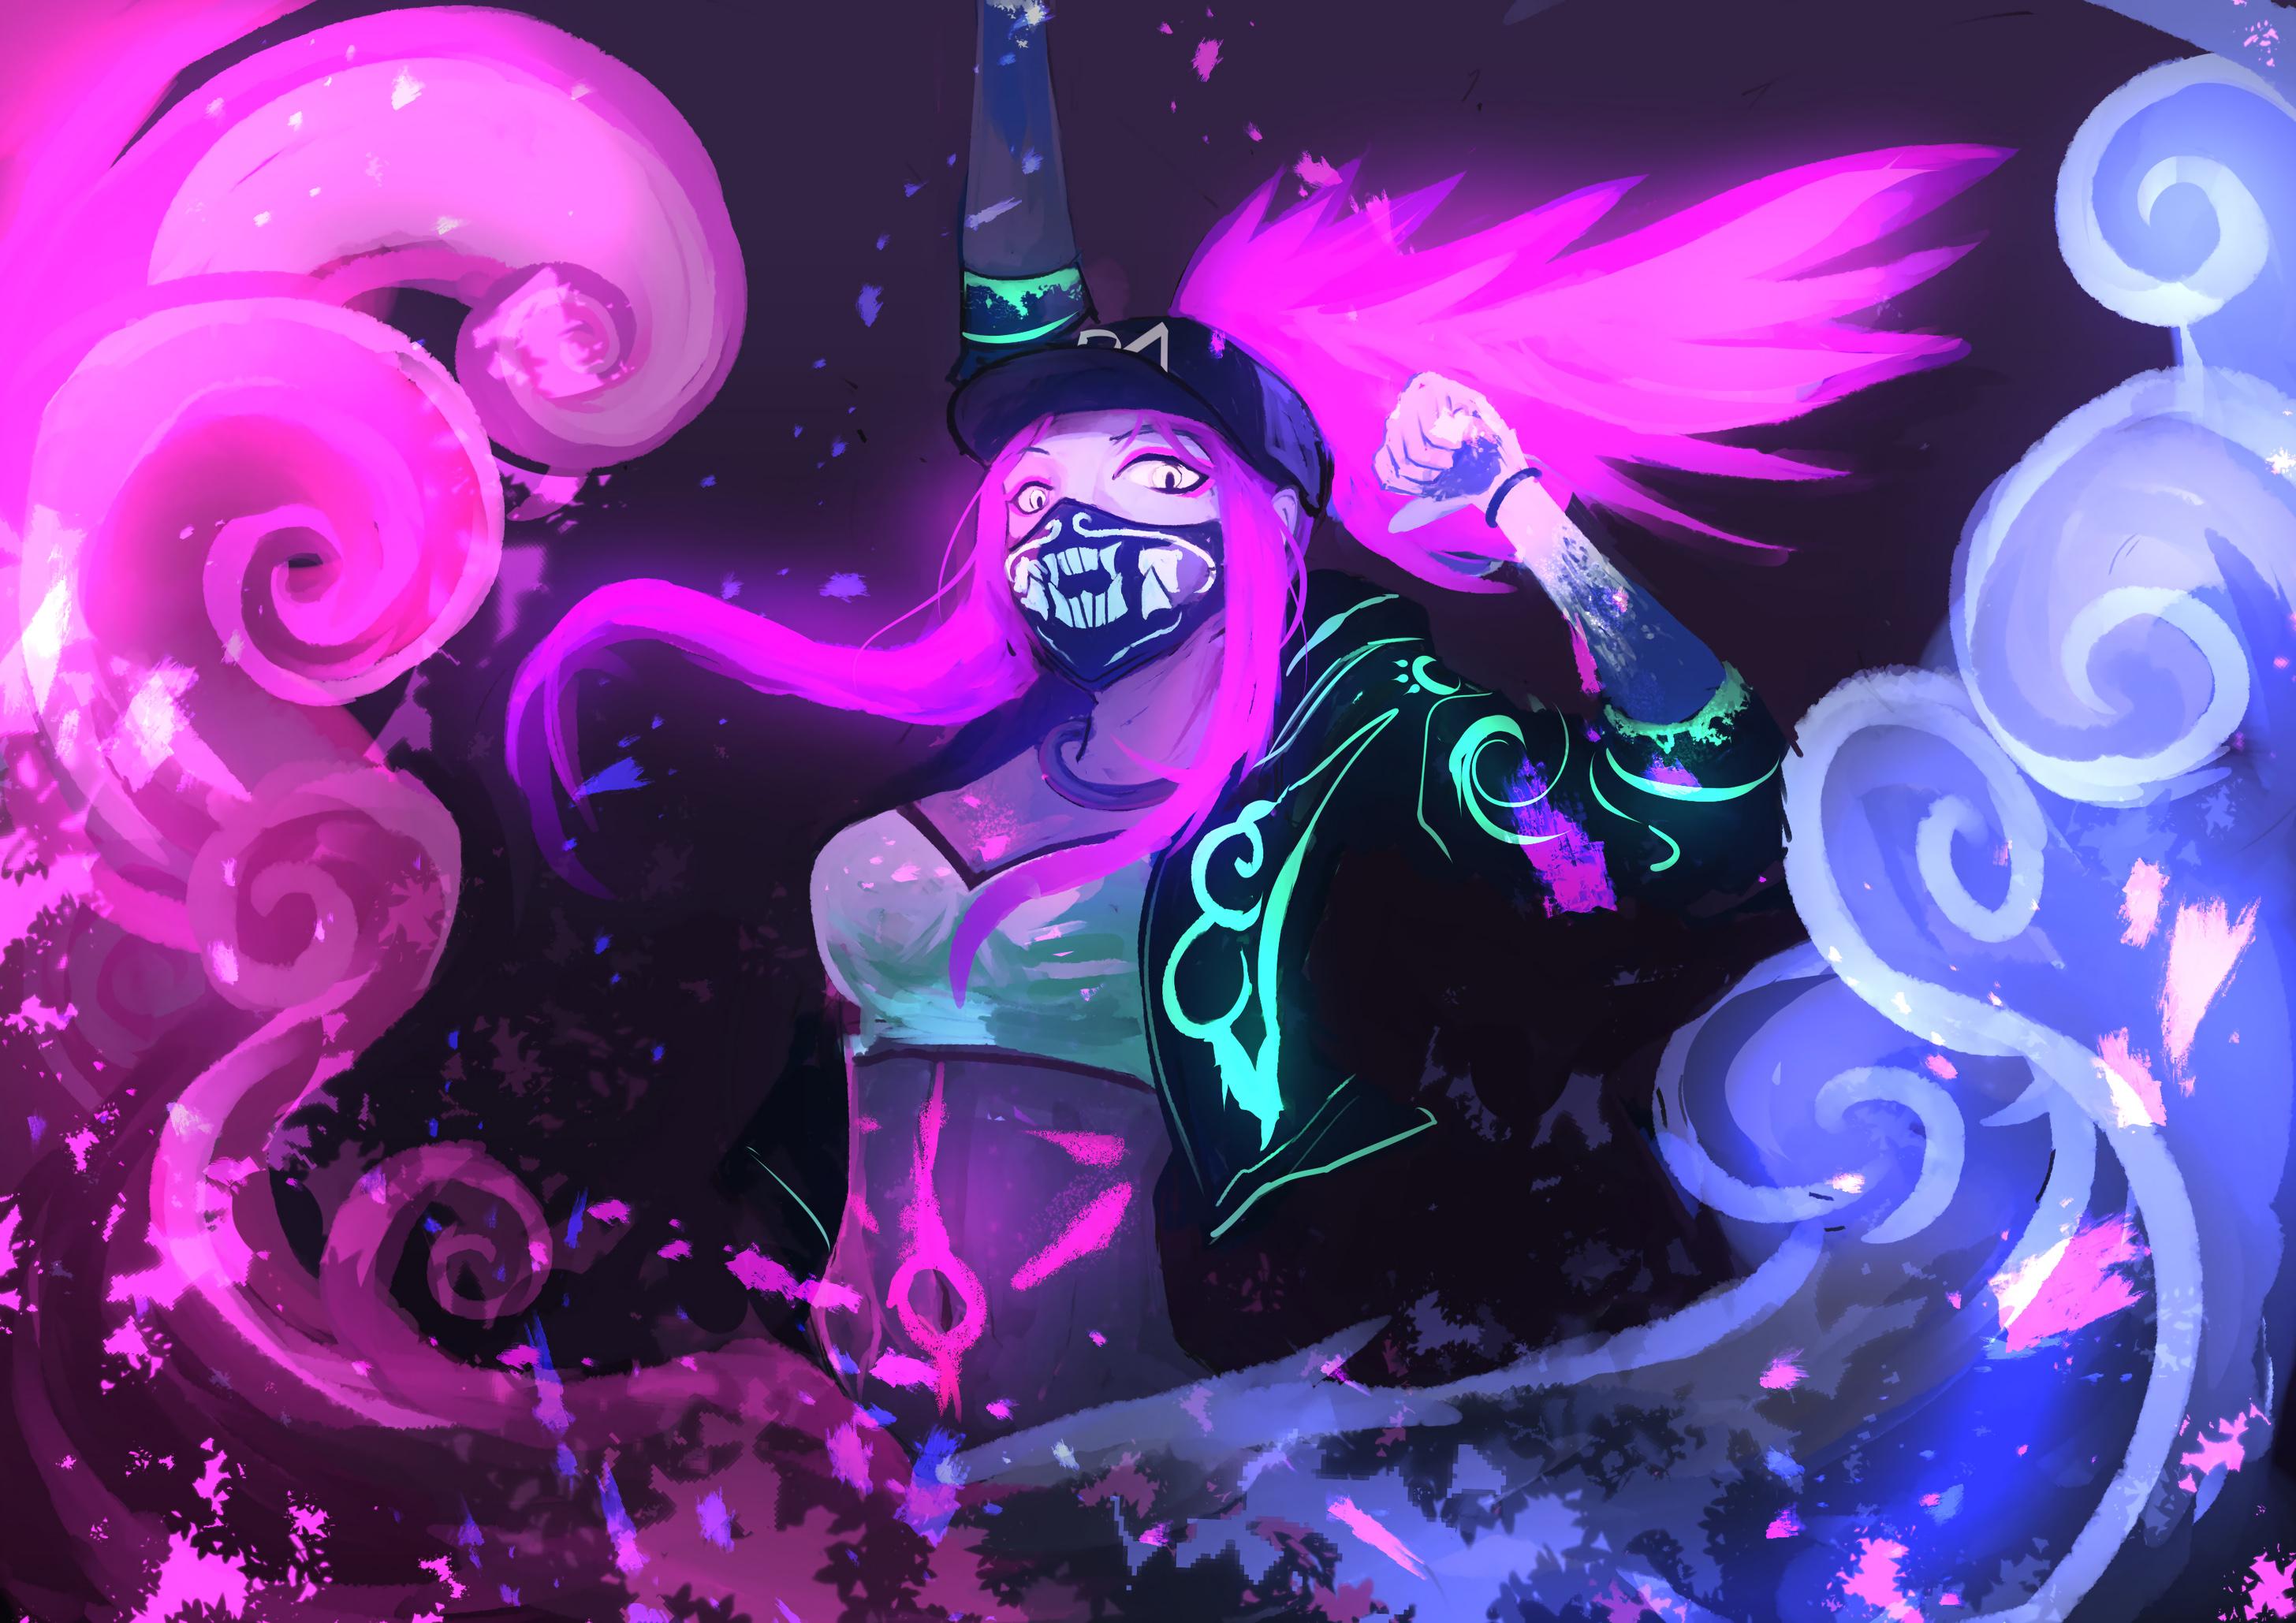 K Da Akali By Yashyuu Hd Wallpaper Background Fan Art Video Game